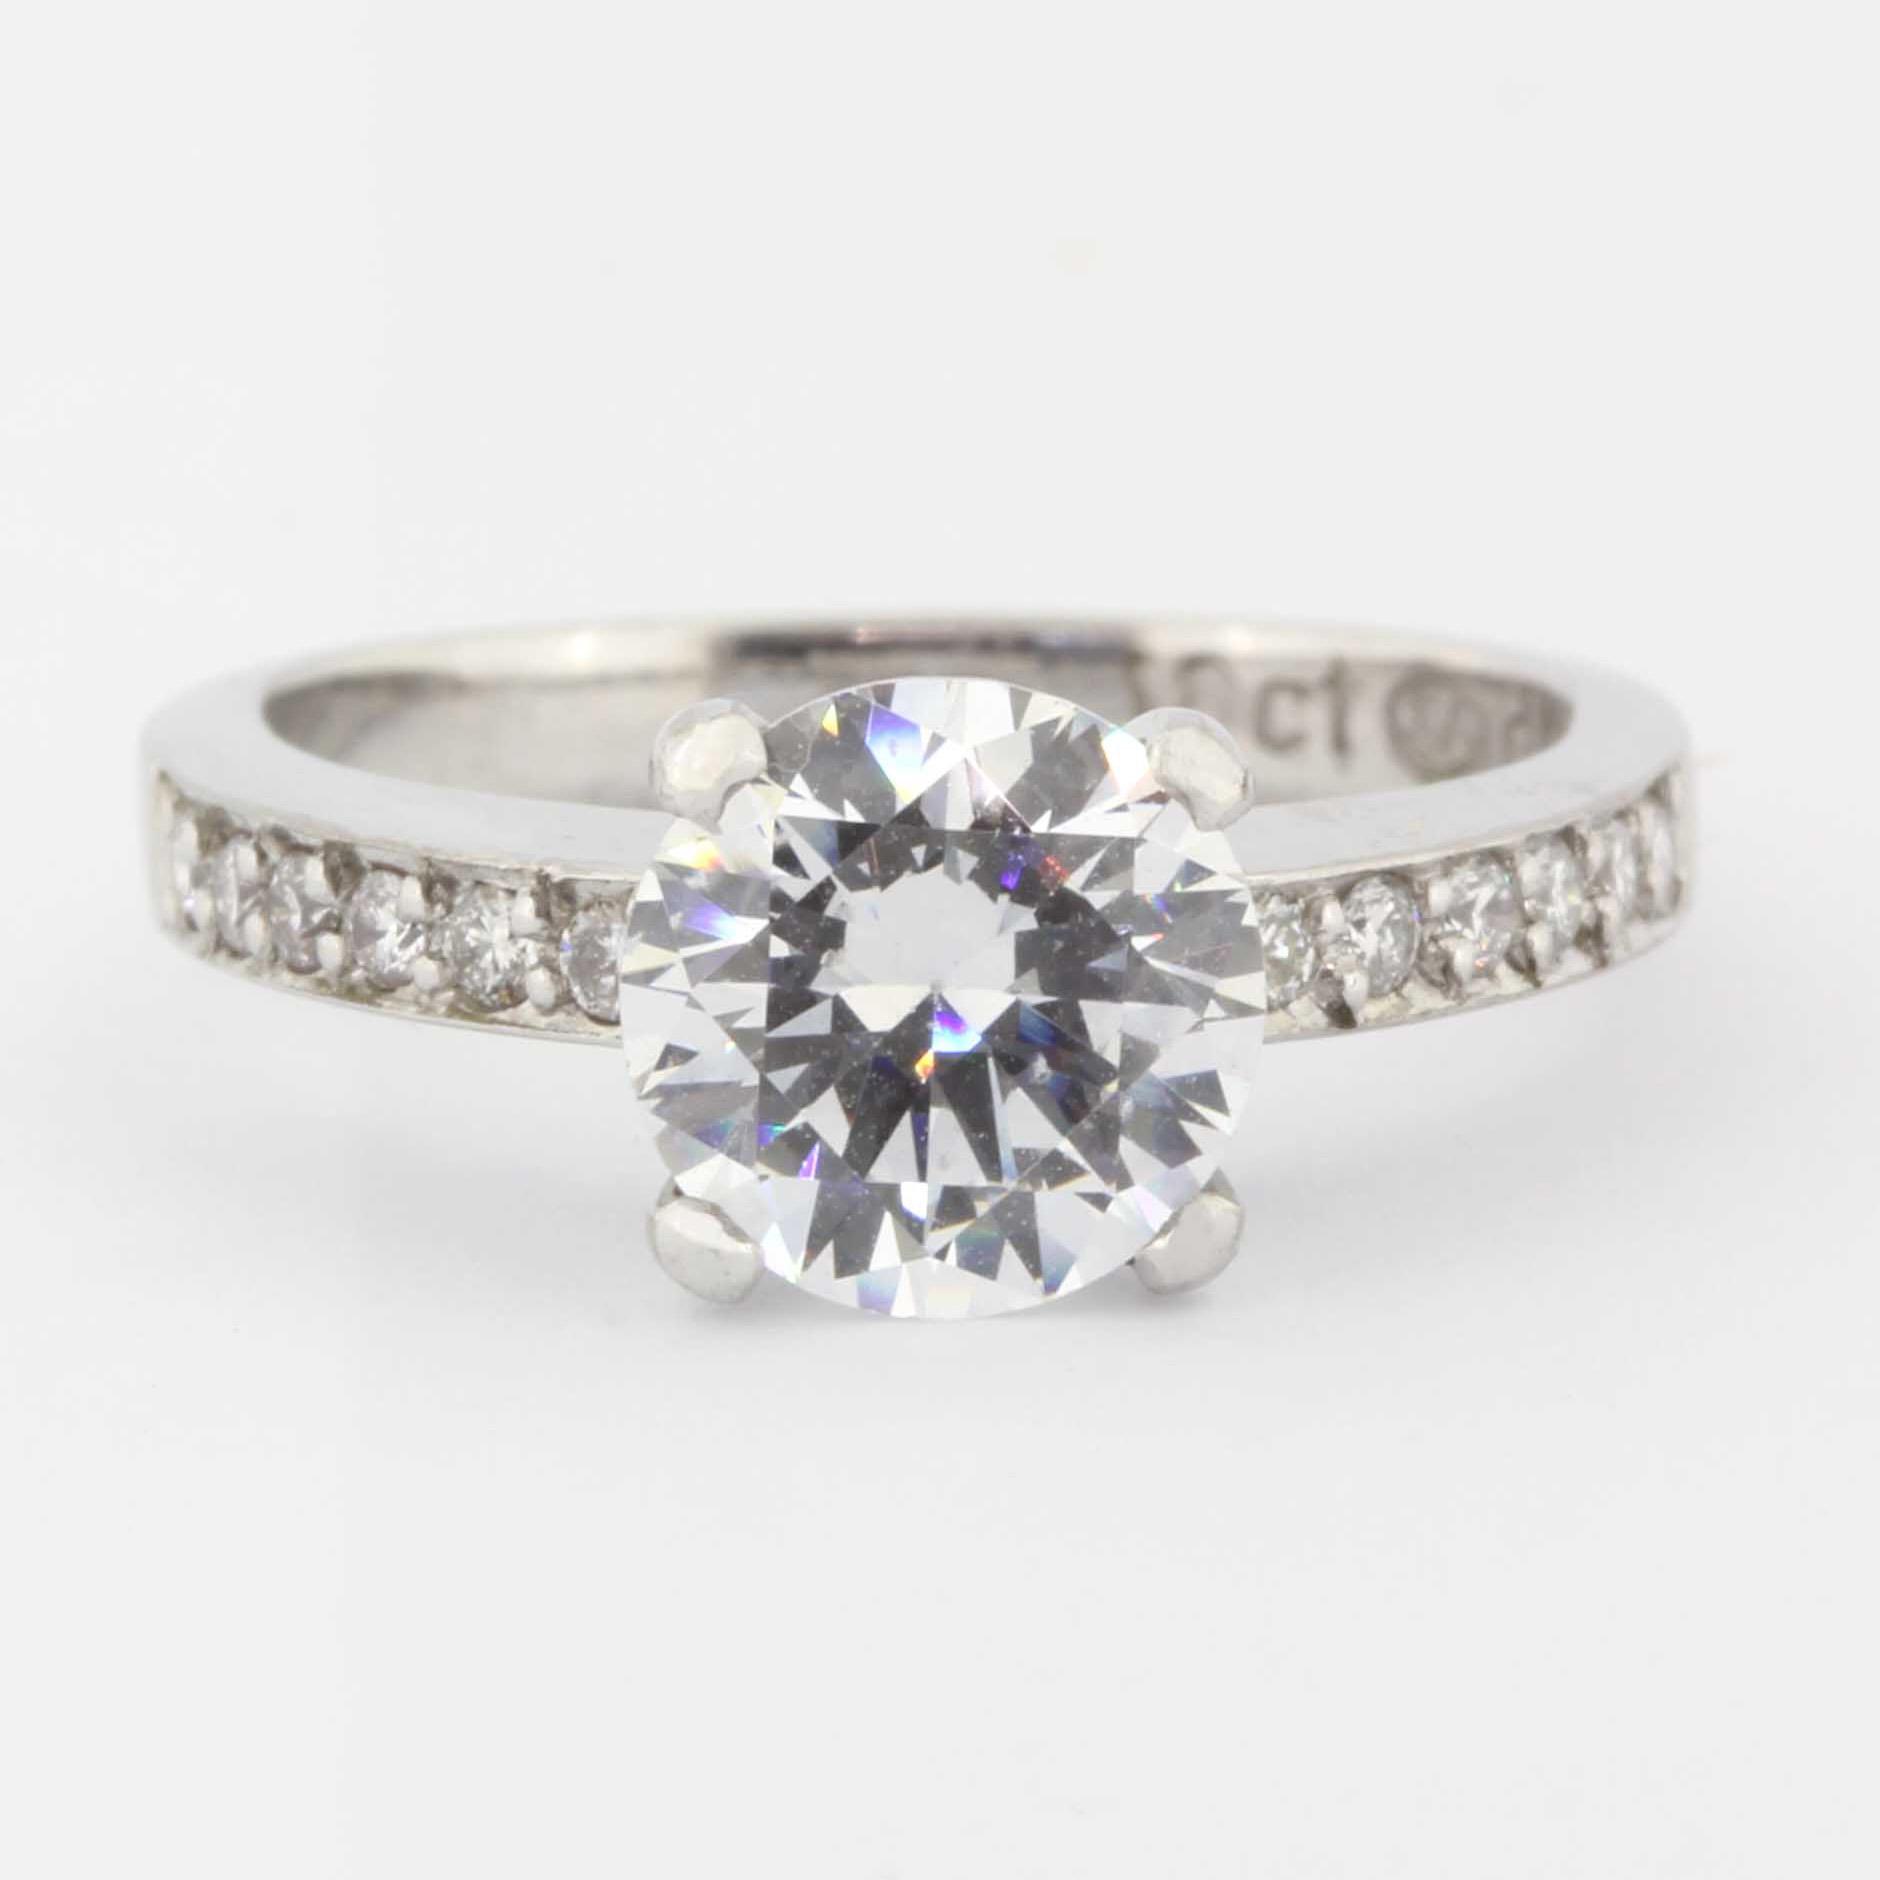 diamond-ring-5-ring-catalogue-david-batchelor-jeweller-jewellery-design-catalogue-durban-portfolio